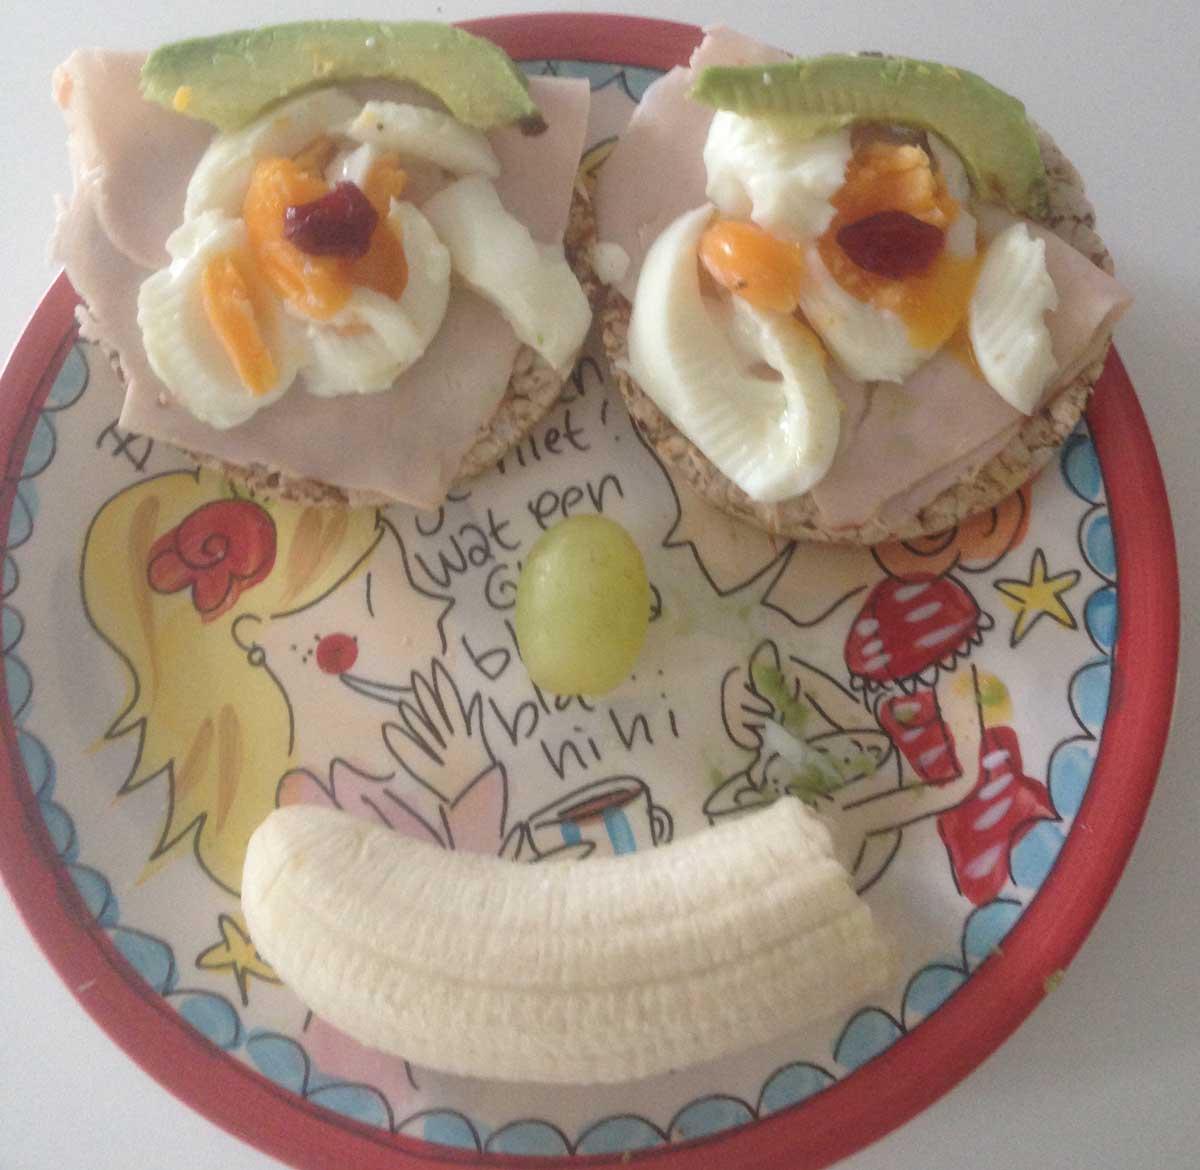 gezond broodbeleg fruit op brood